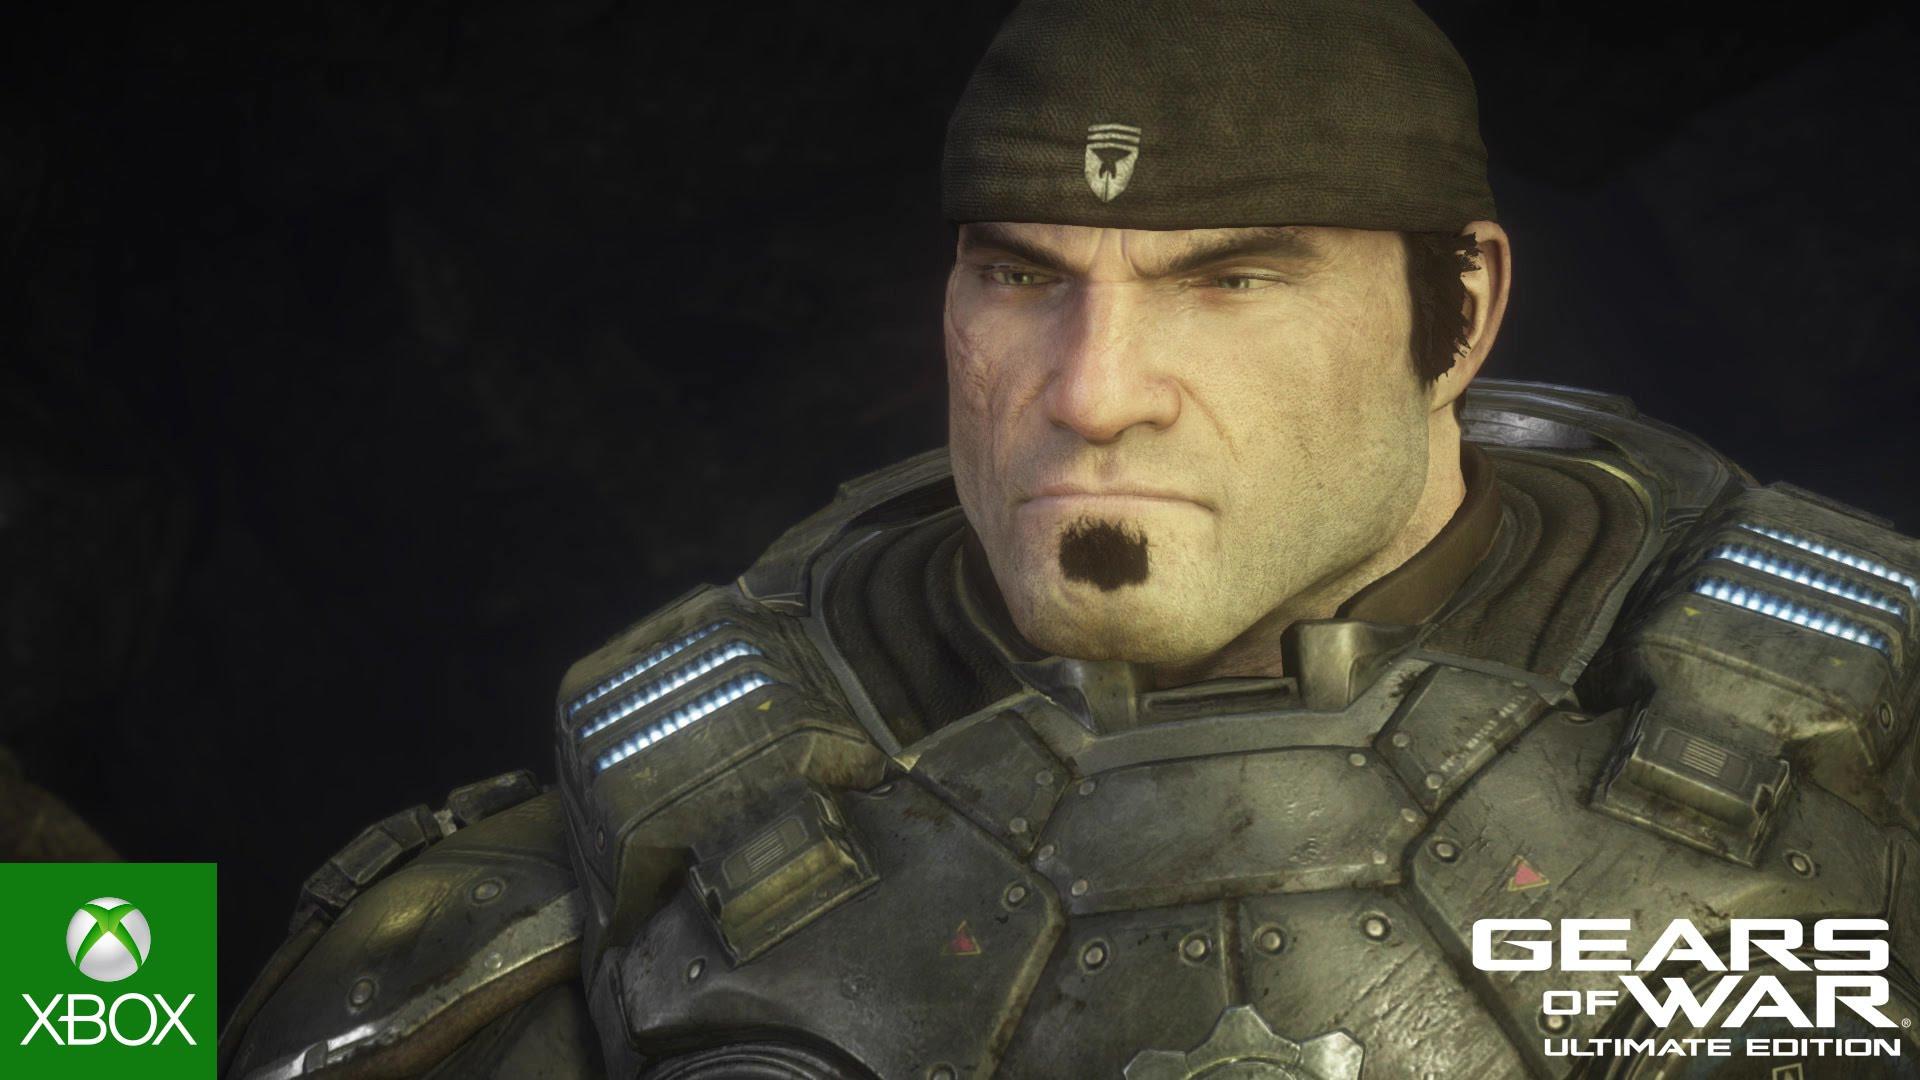 Marcus Fenix sobe em Gears of War: Ultimate Edition